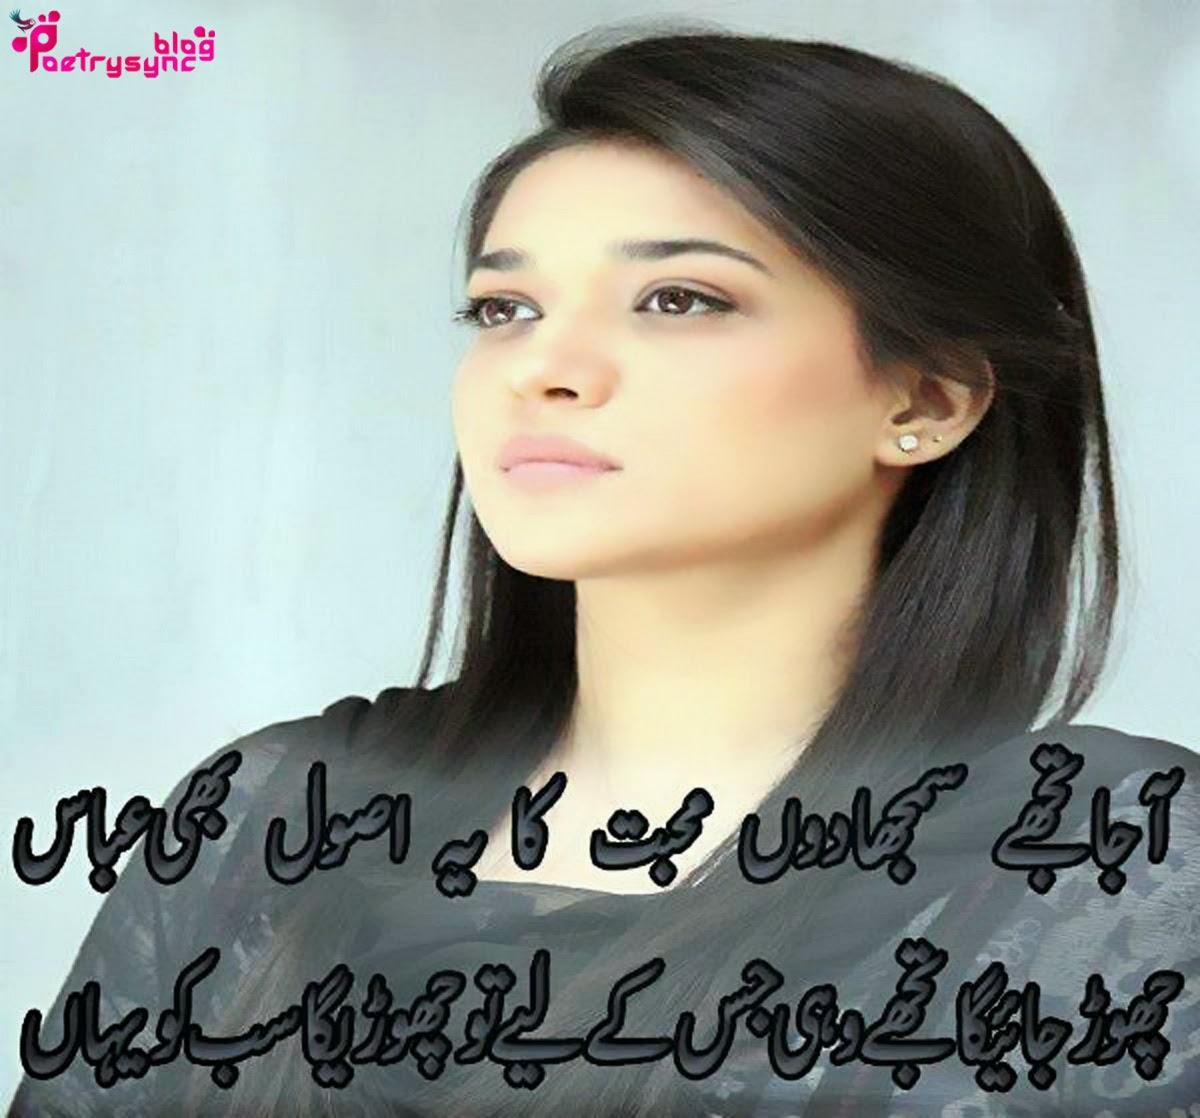 Poetry-Mohabbat-Urdu-Images-Poetry-Shayari-for-Facebook-Timeline-Posts-wallpaper-wp580788